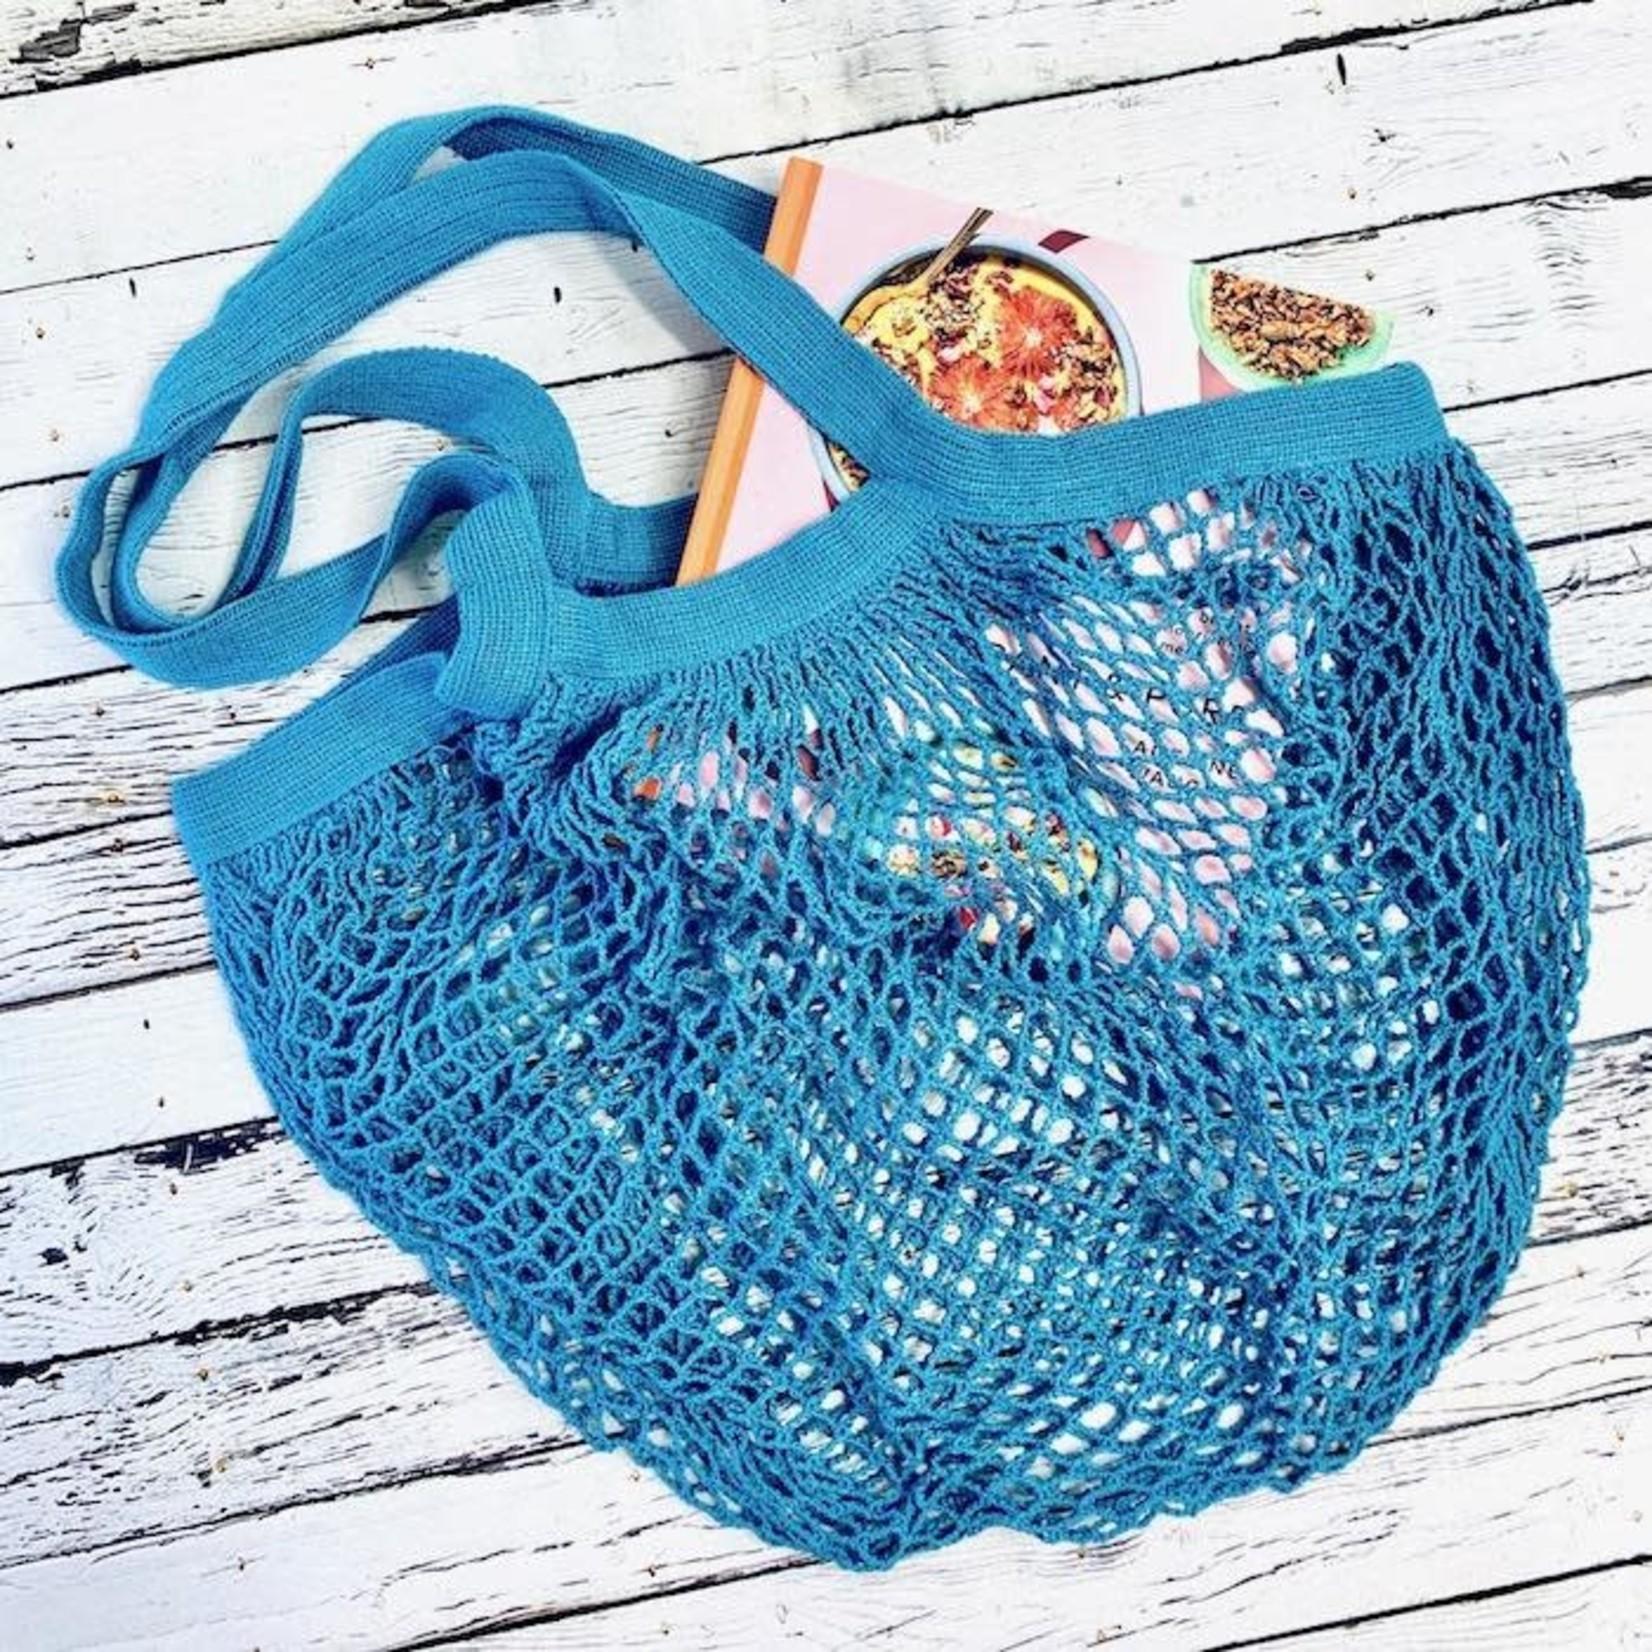 Le Marche Shopping Bags